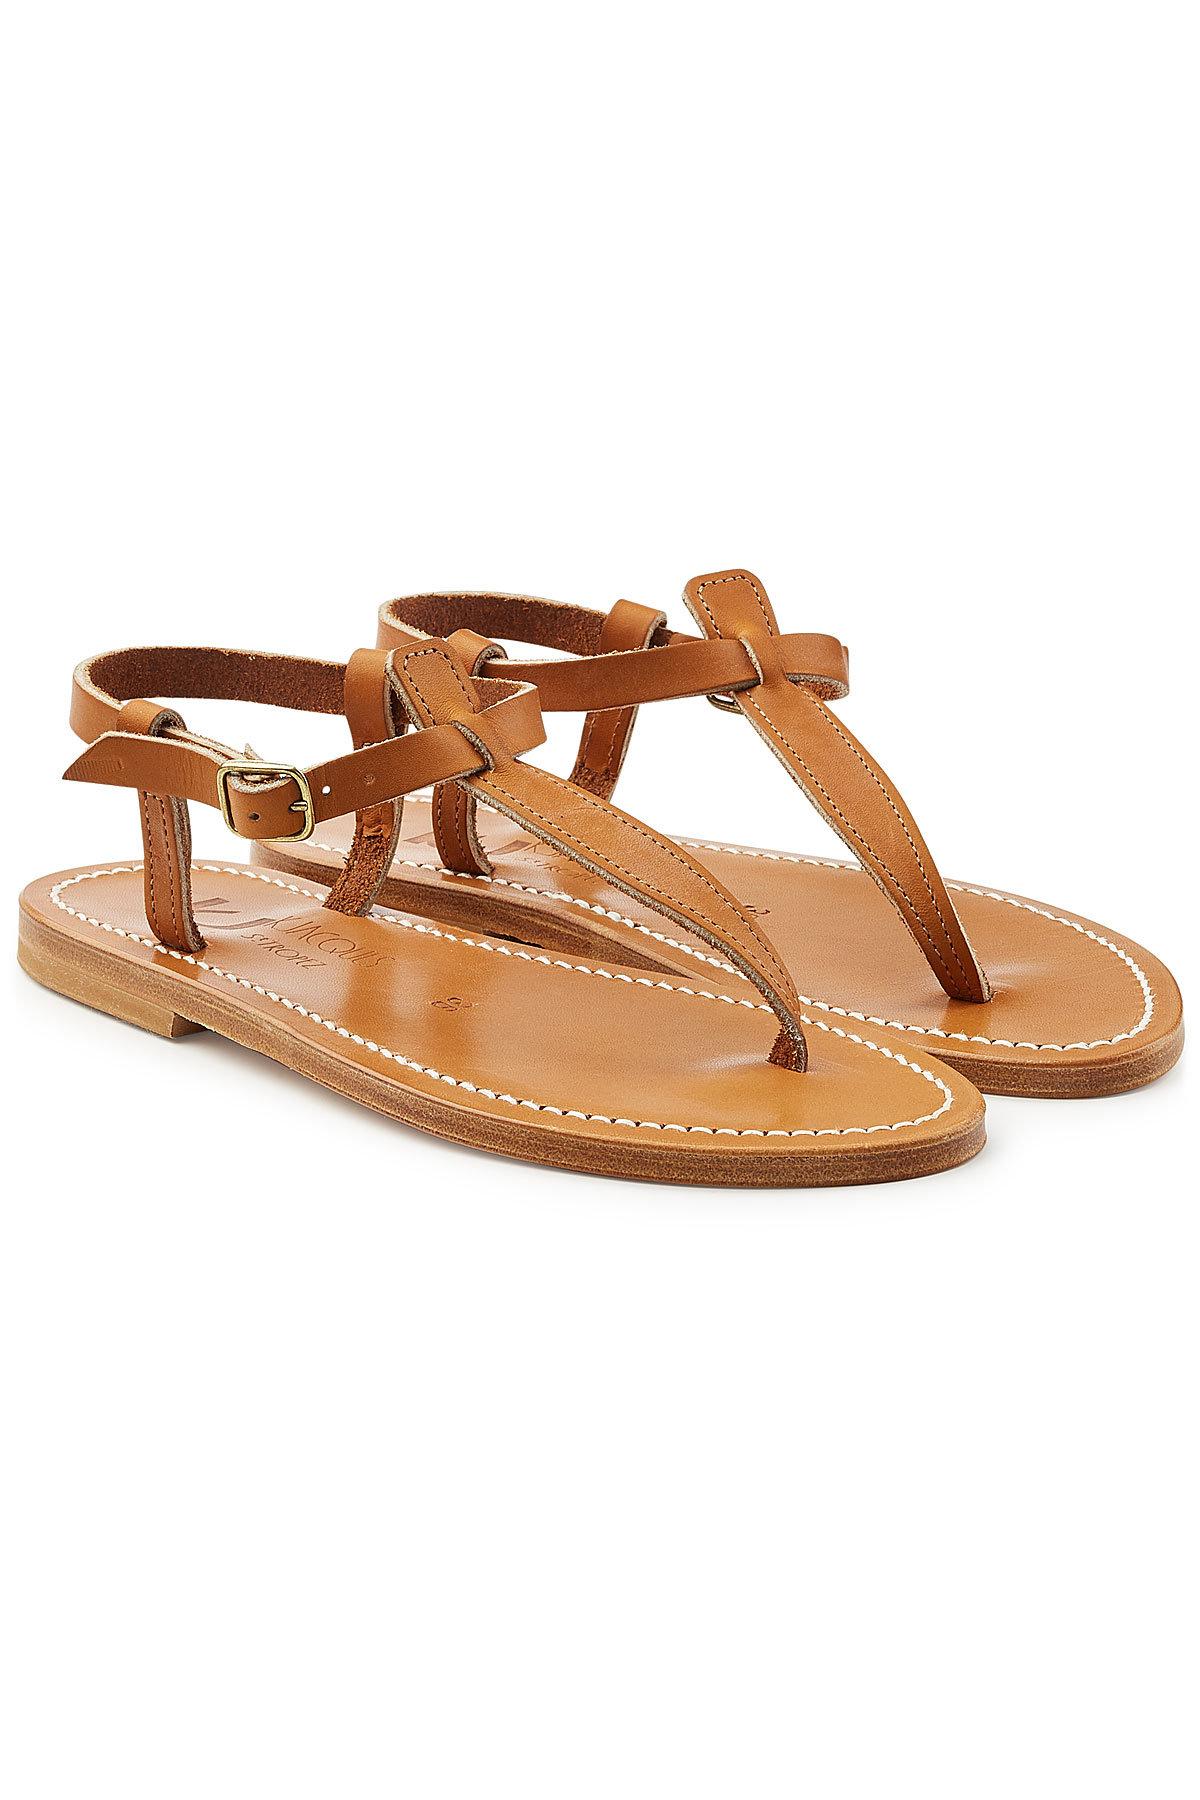 K jacques Metallic Leather Sandals Gr. IT 38 h4vVwUOZo